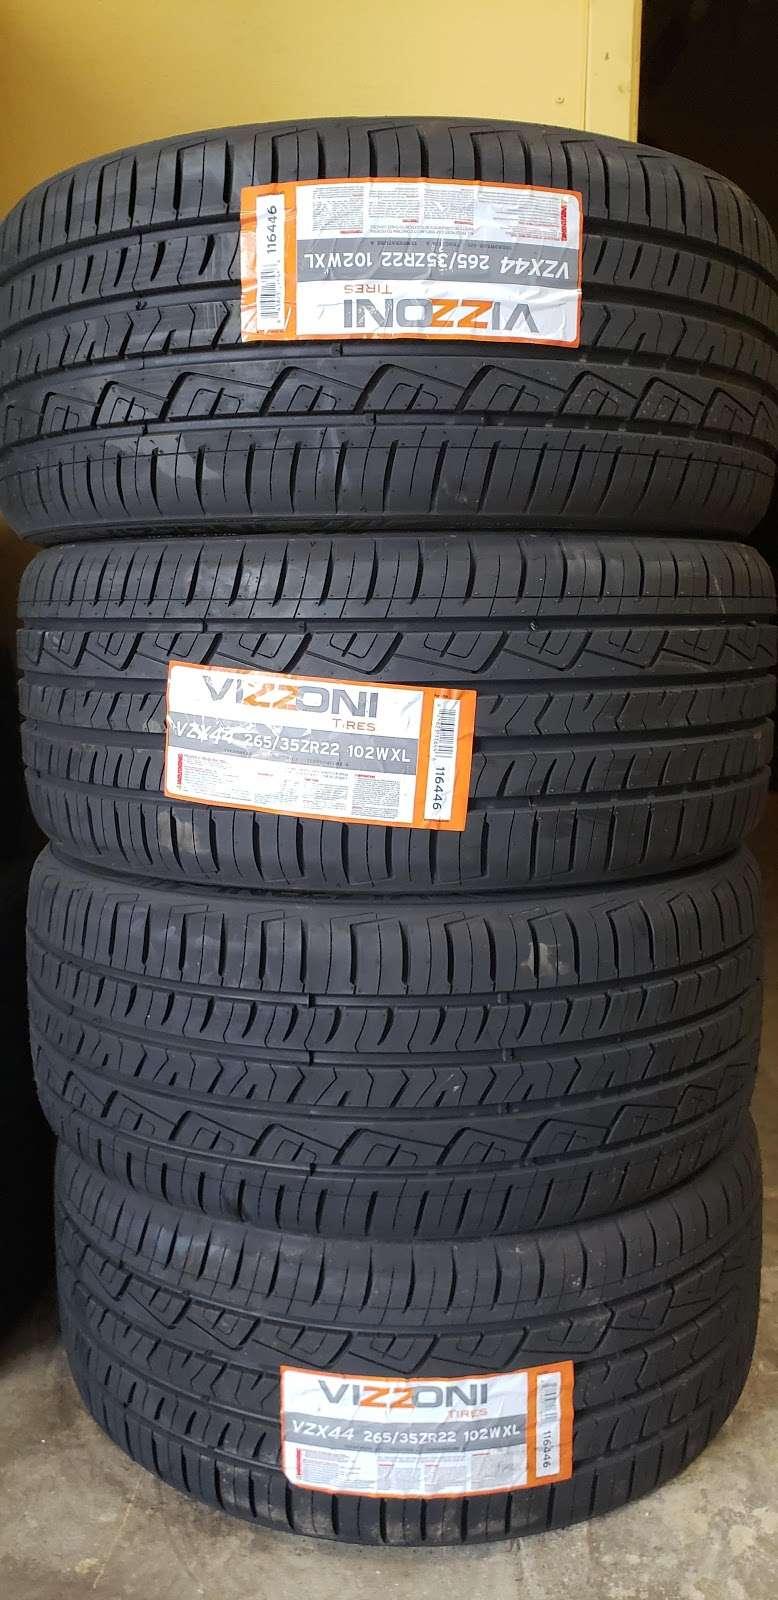 Sierra's Tire Shop - car repair  | Photo 10 of 10 | Address: 8105 Bayway Dr, Baytown, TX 77520, USA | Phone: (346) 265-1754